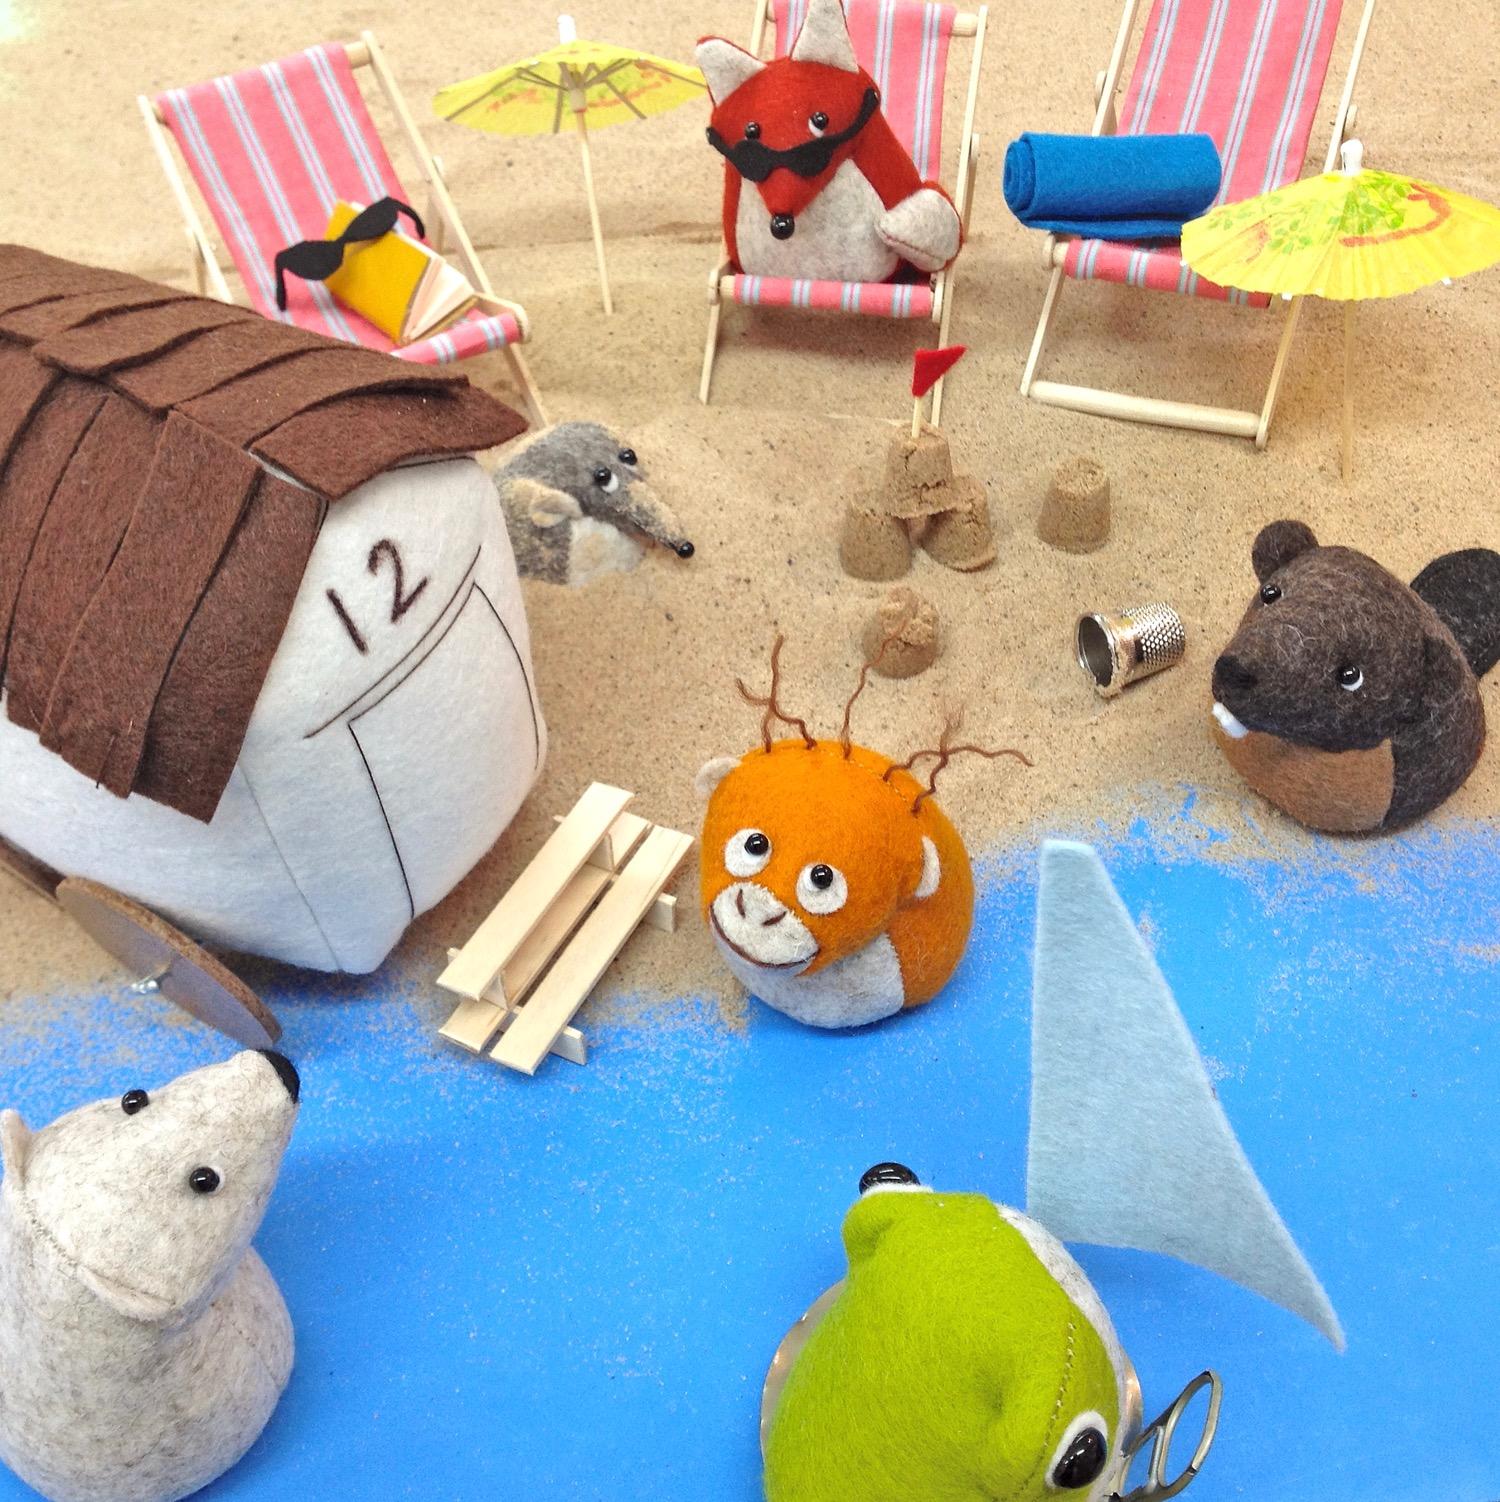 DIY Miniature Deck Chair Photo Tutorial - Felt Animals on the Beachby Bilberry Woods